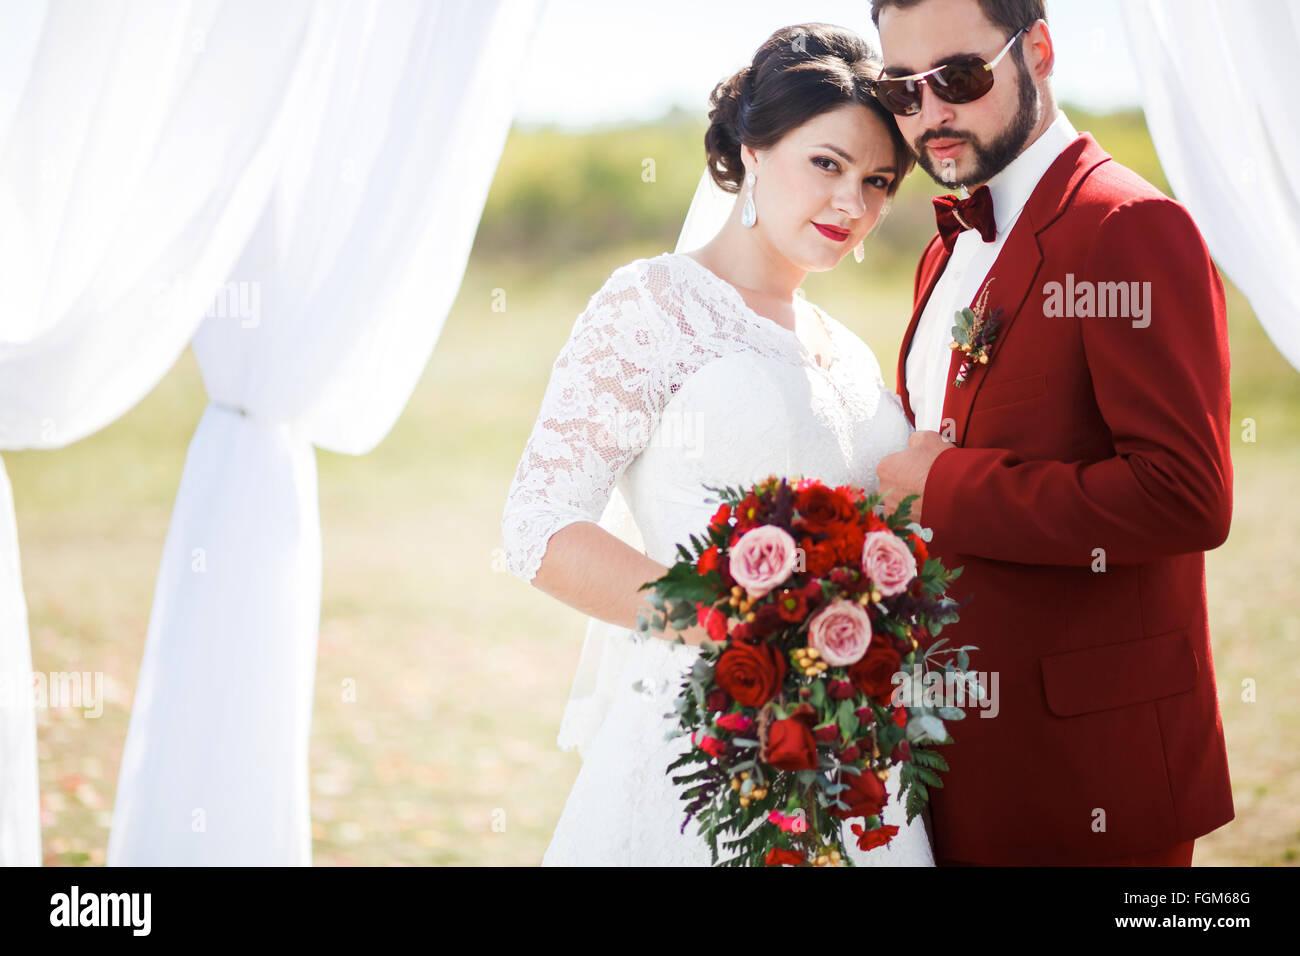 Extravagant Bride And Groom Lovely Couple Wedding Photo